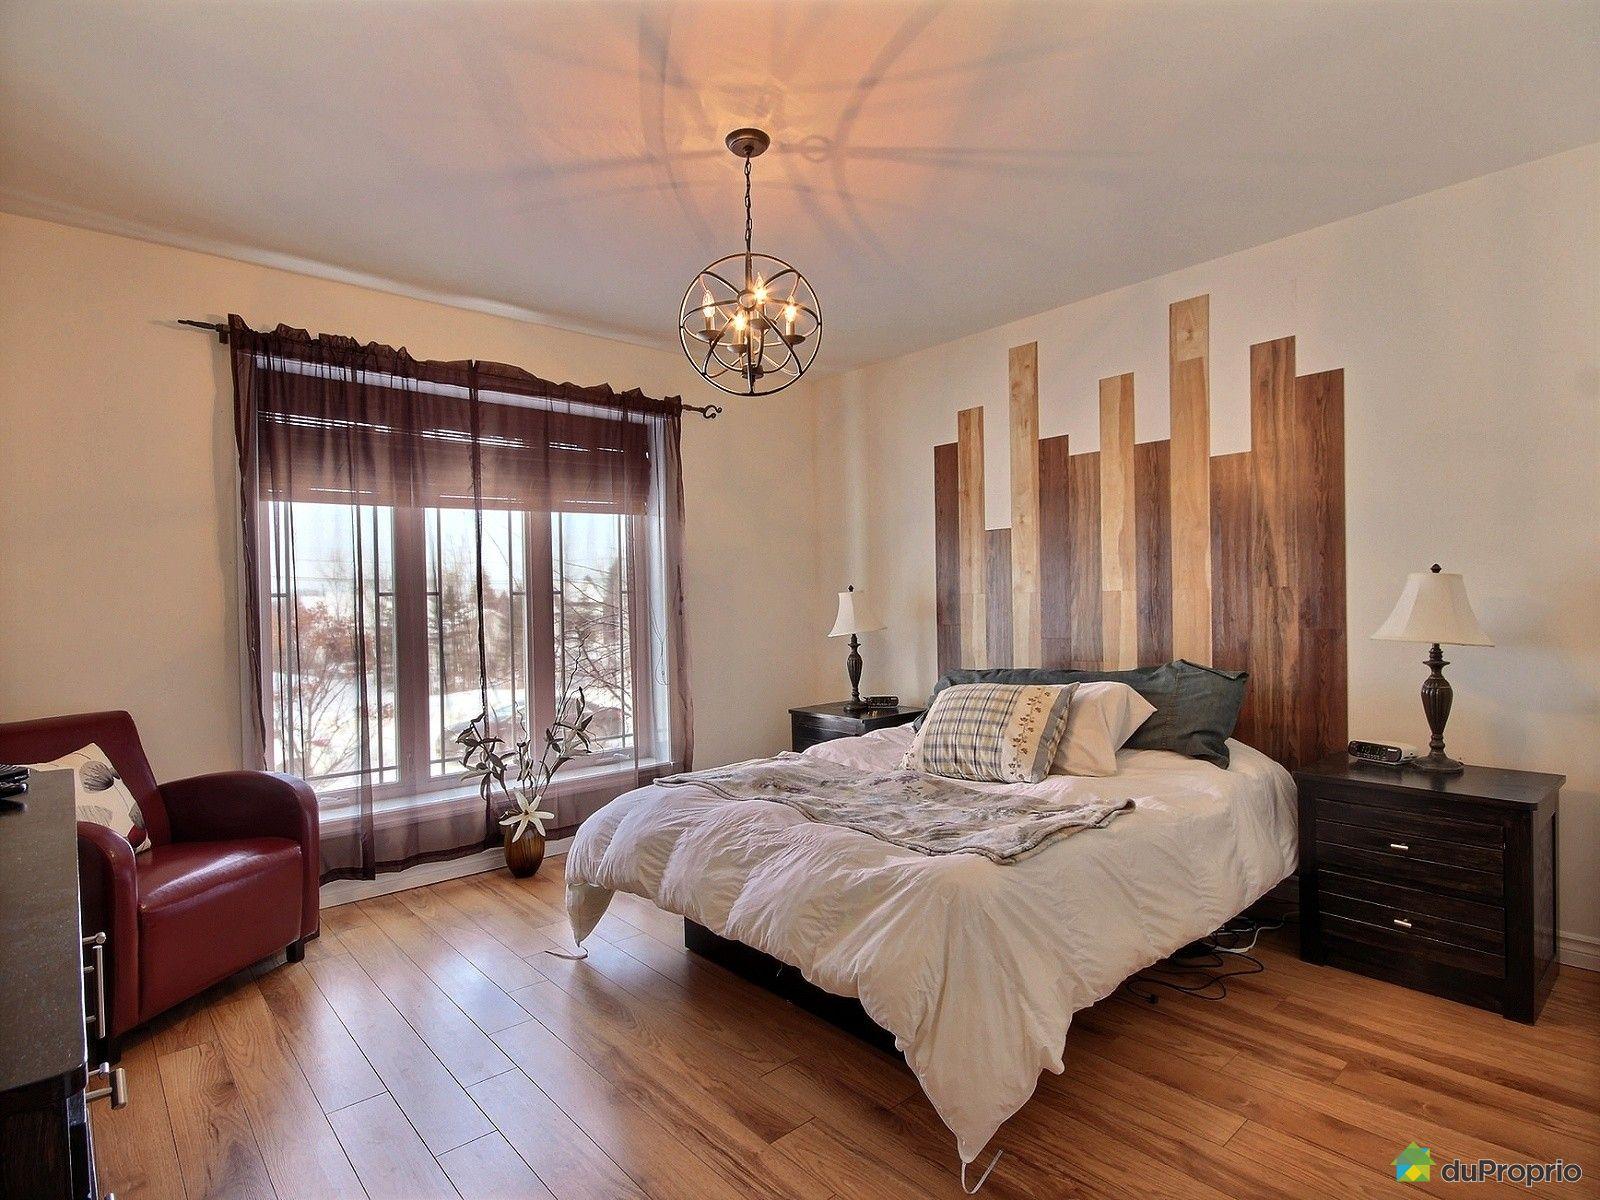 Maison vendre alma 385 rue ouimet immobilier qu bec for Chambre a coucher alma